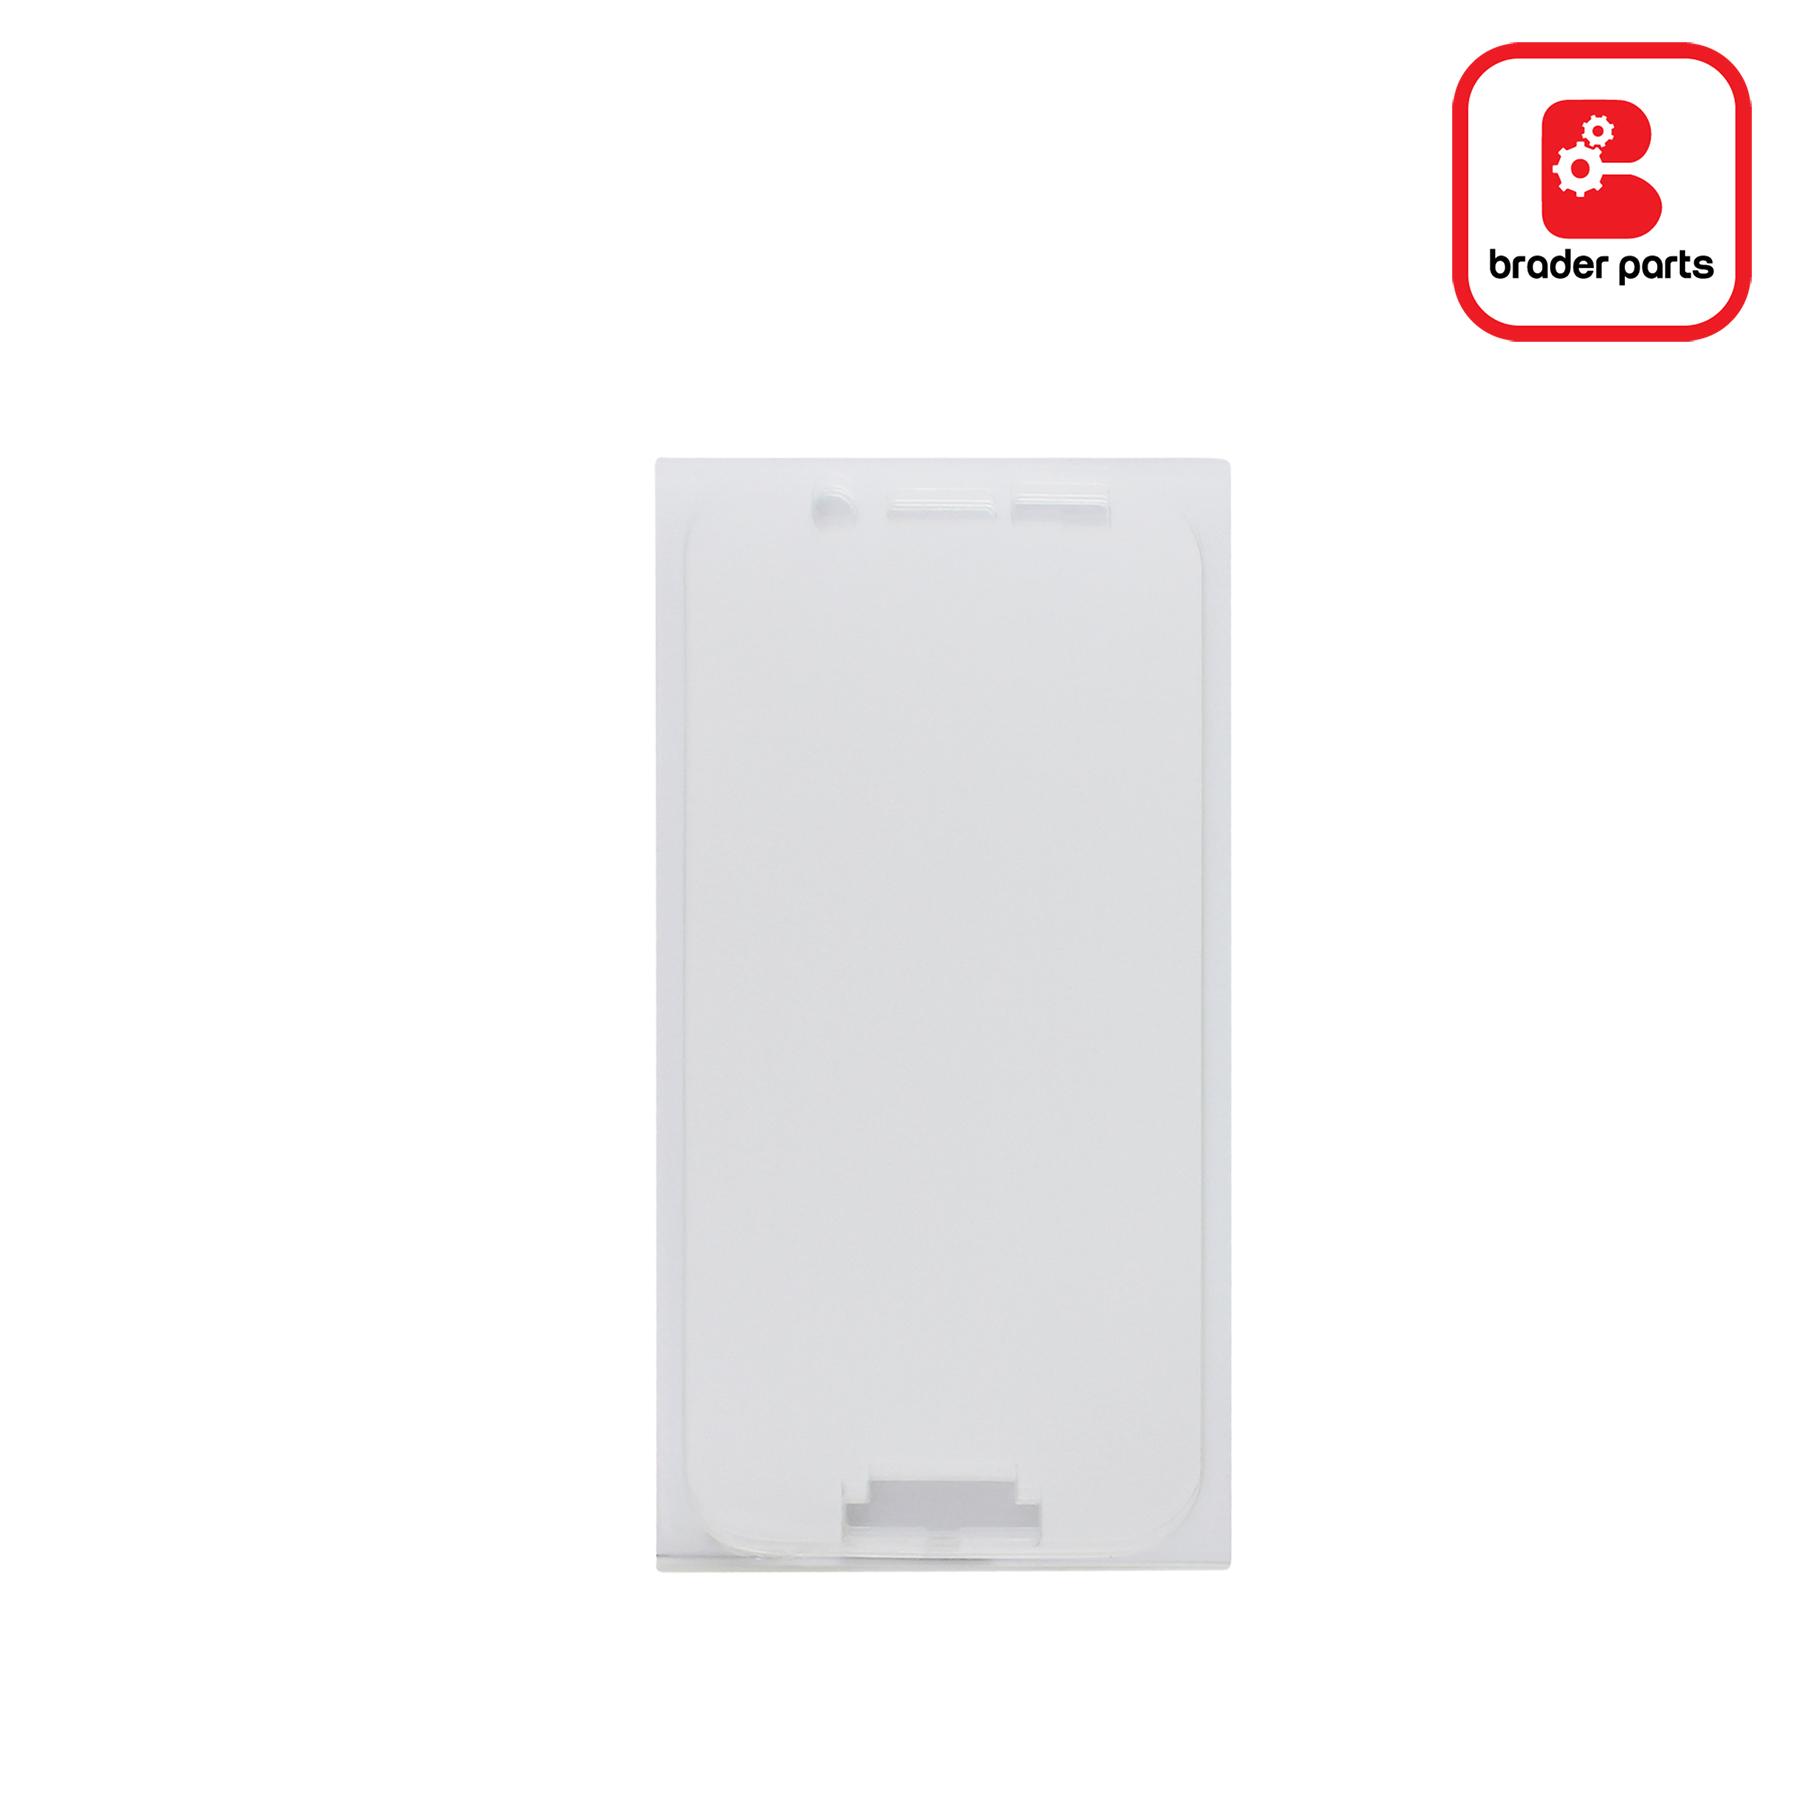 Lem Oca Samsung Sm-G925F / S6 Edge